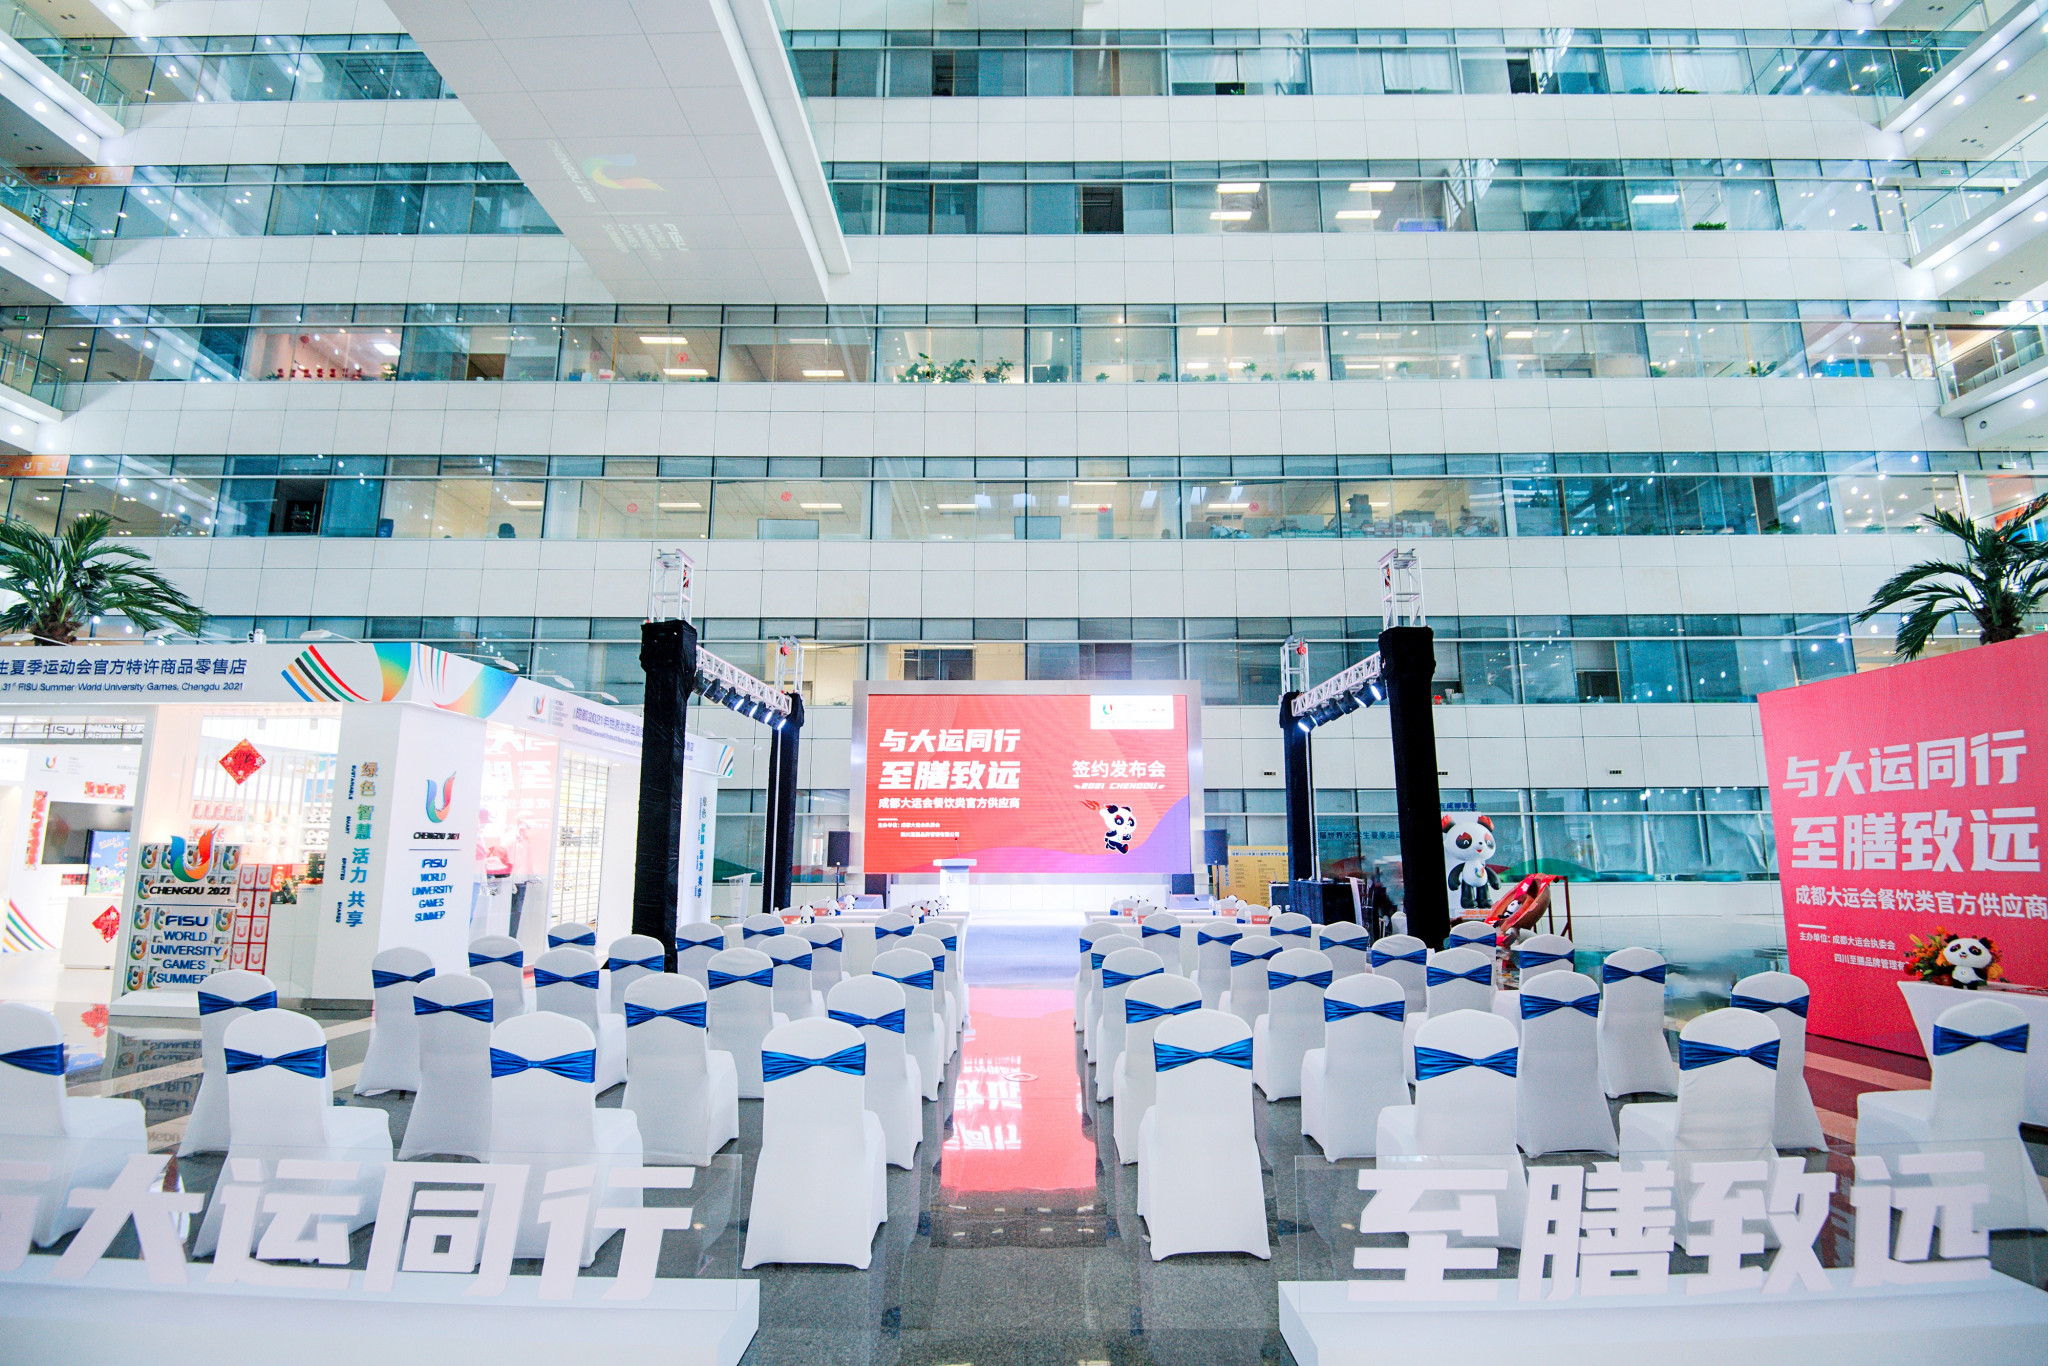 Zhishan Brand will supply food and beverages at Chengdu 2021 ©Chengdu 2021